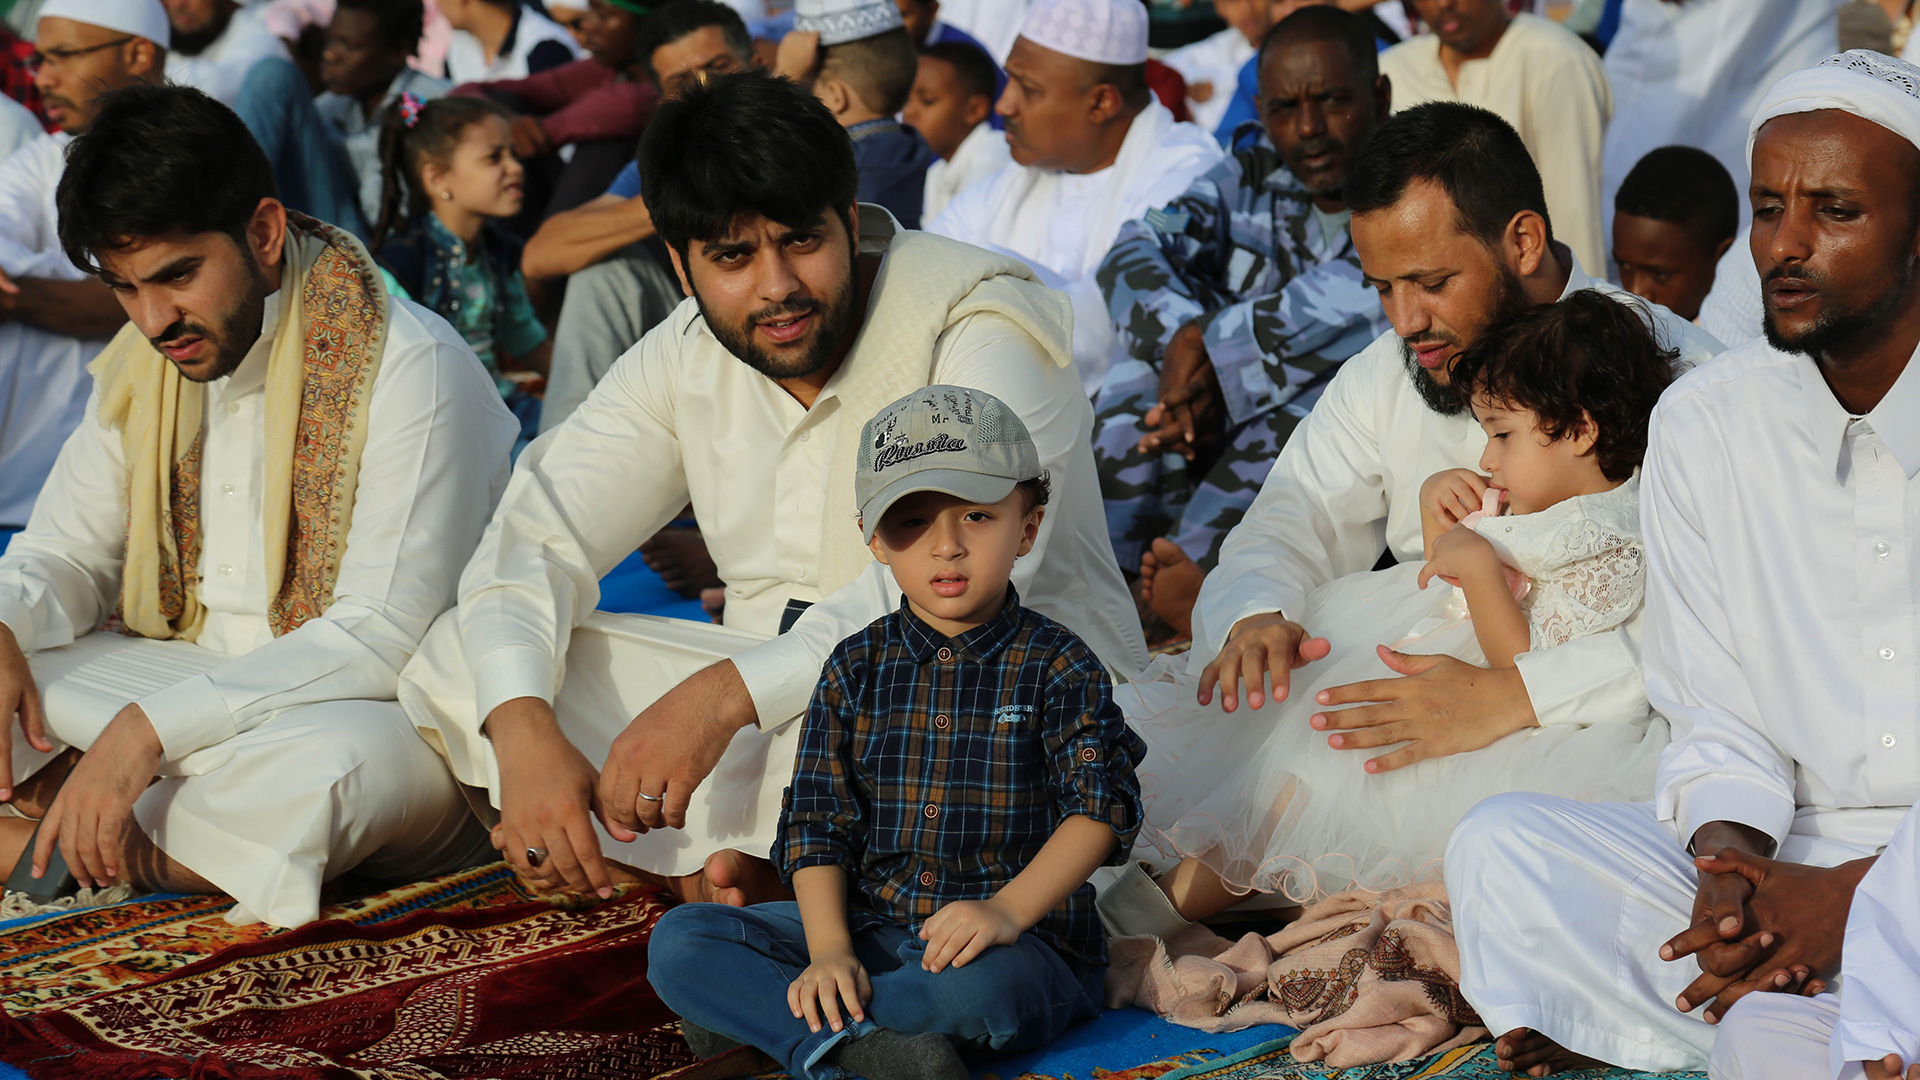 Bina-Qurani-Pentingnya-dan-keutamaan-Menghormati-Orang-Tua-selama-hidup-di-dunia